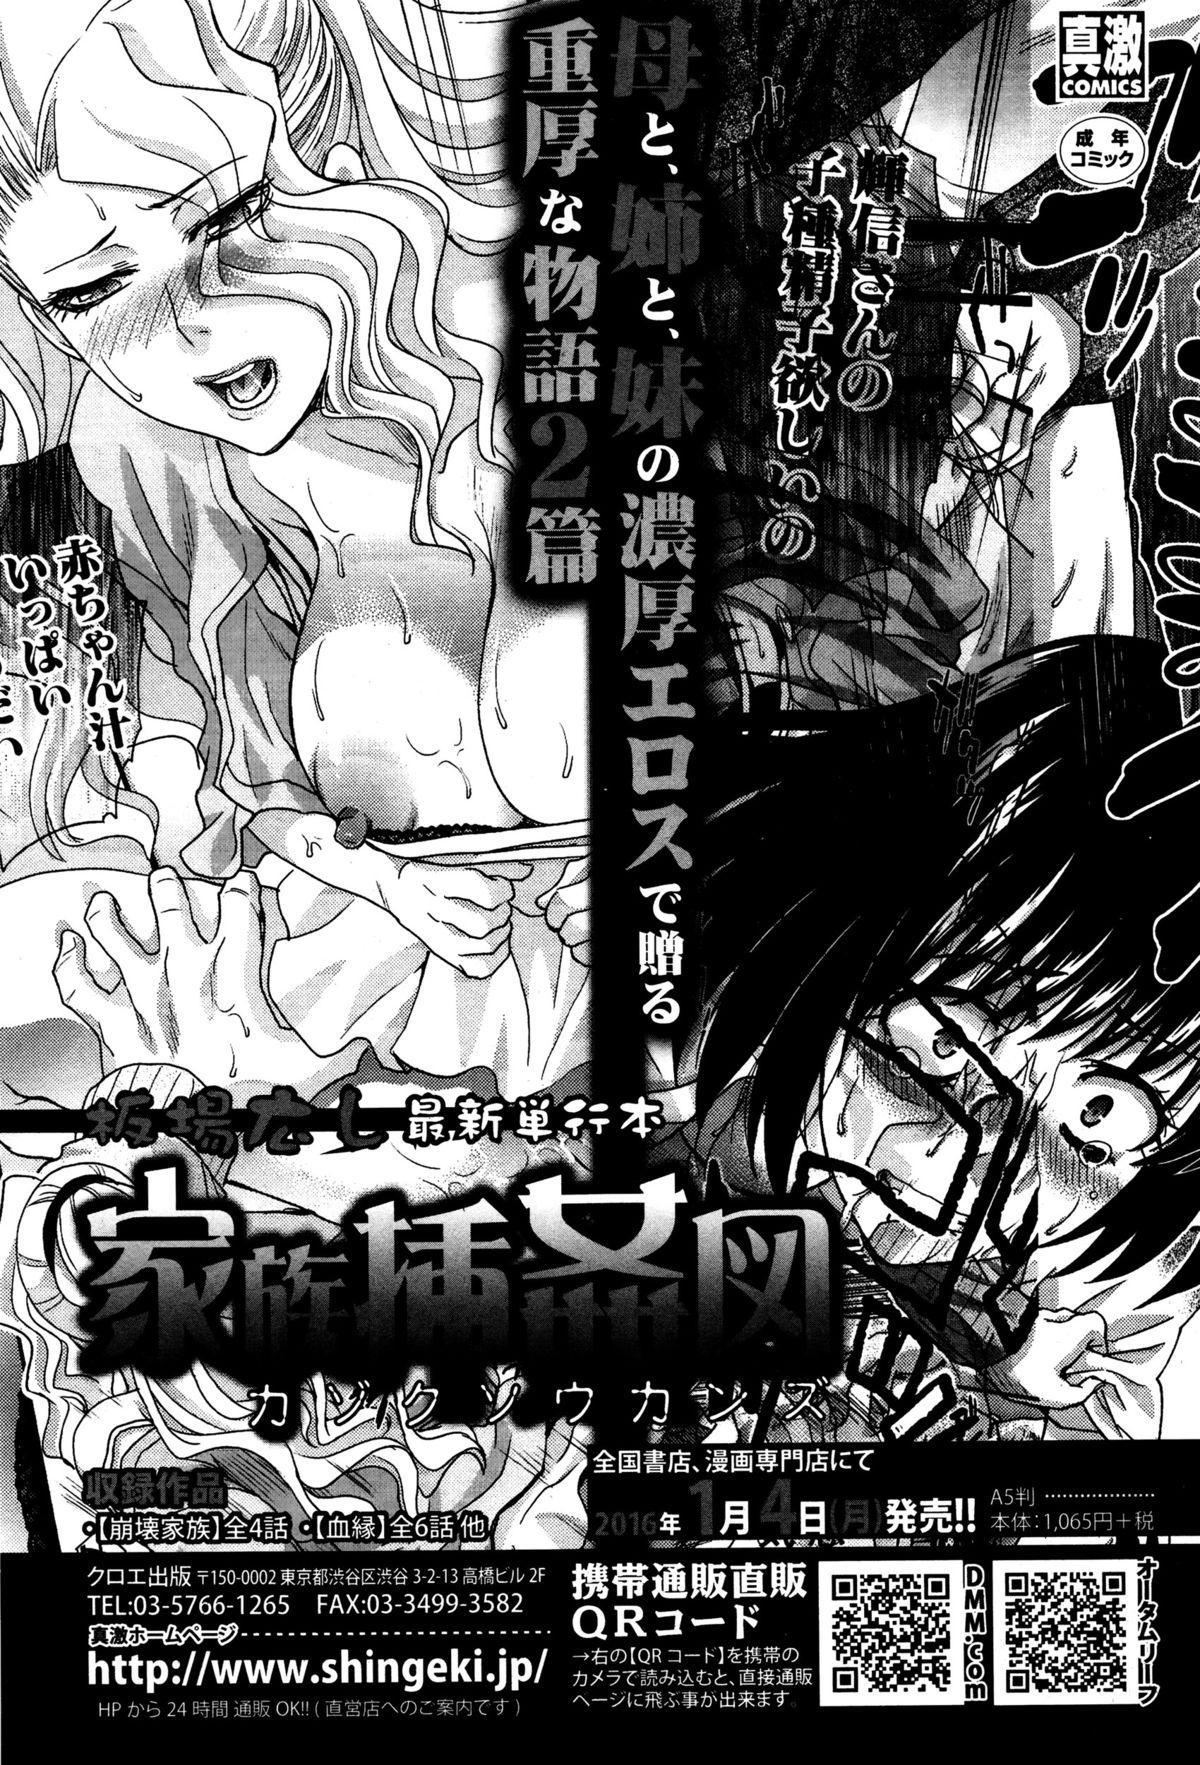 COMIC Shingeki 2016-01 94